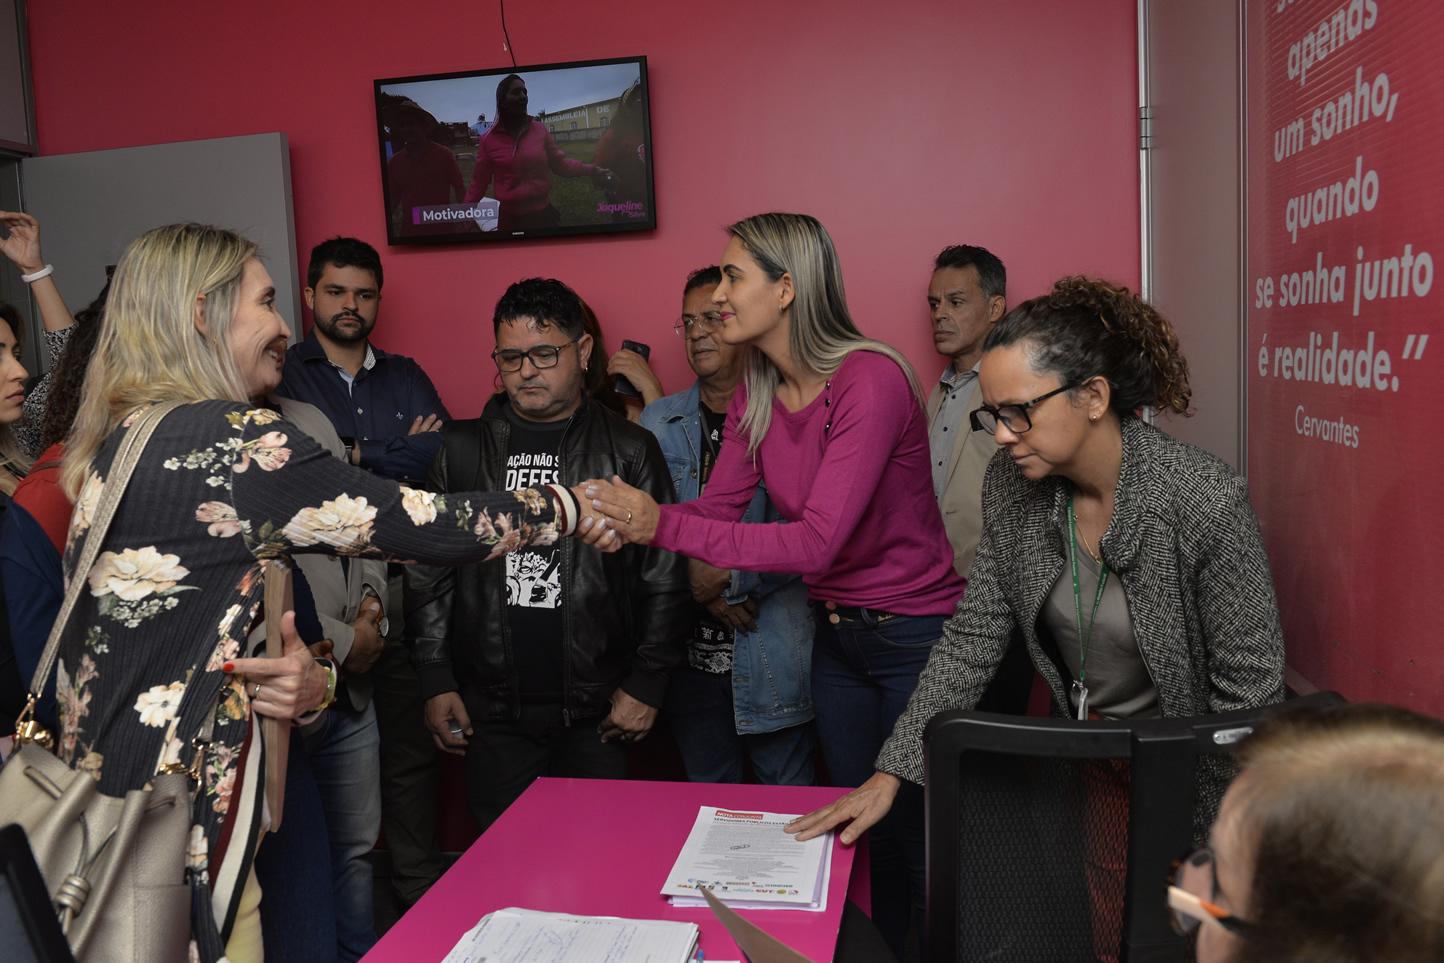 2019.06.13_Visita-aos-gabinetes-contra-o-fim-da-licenca-premio_fotos-Deva-Garcia-15